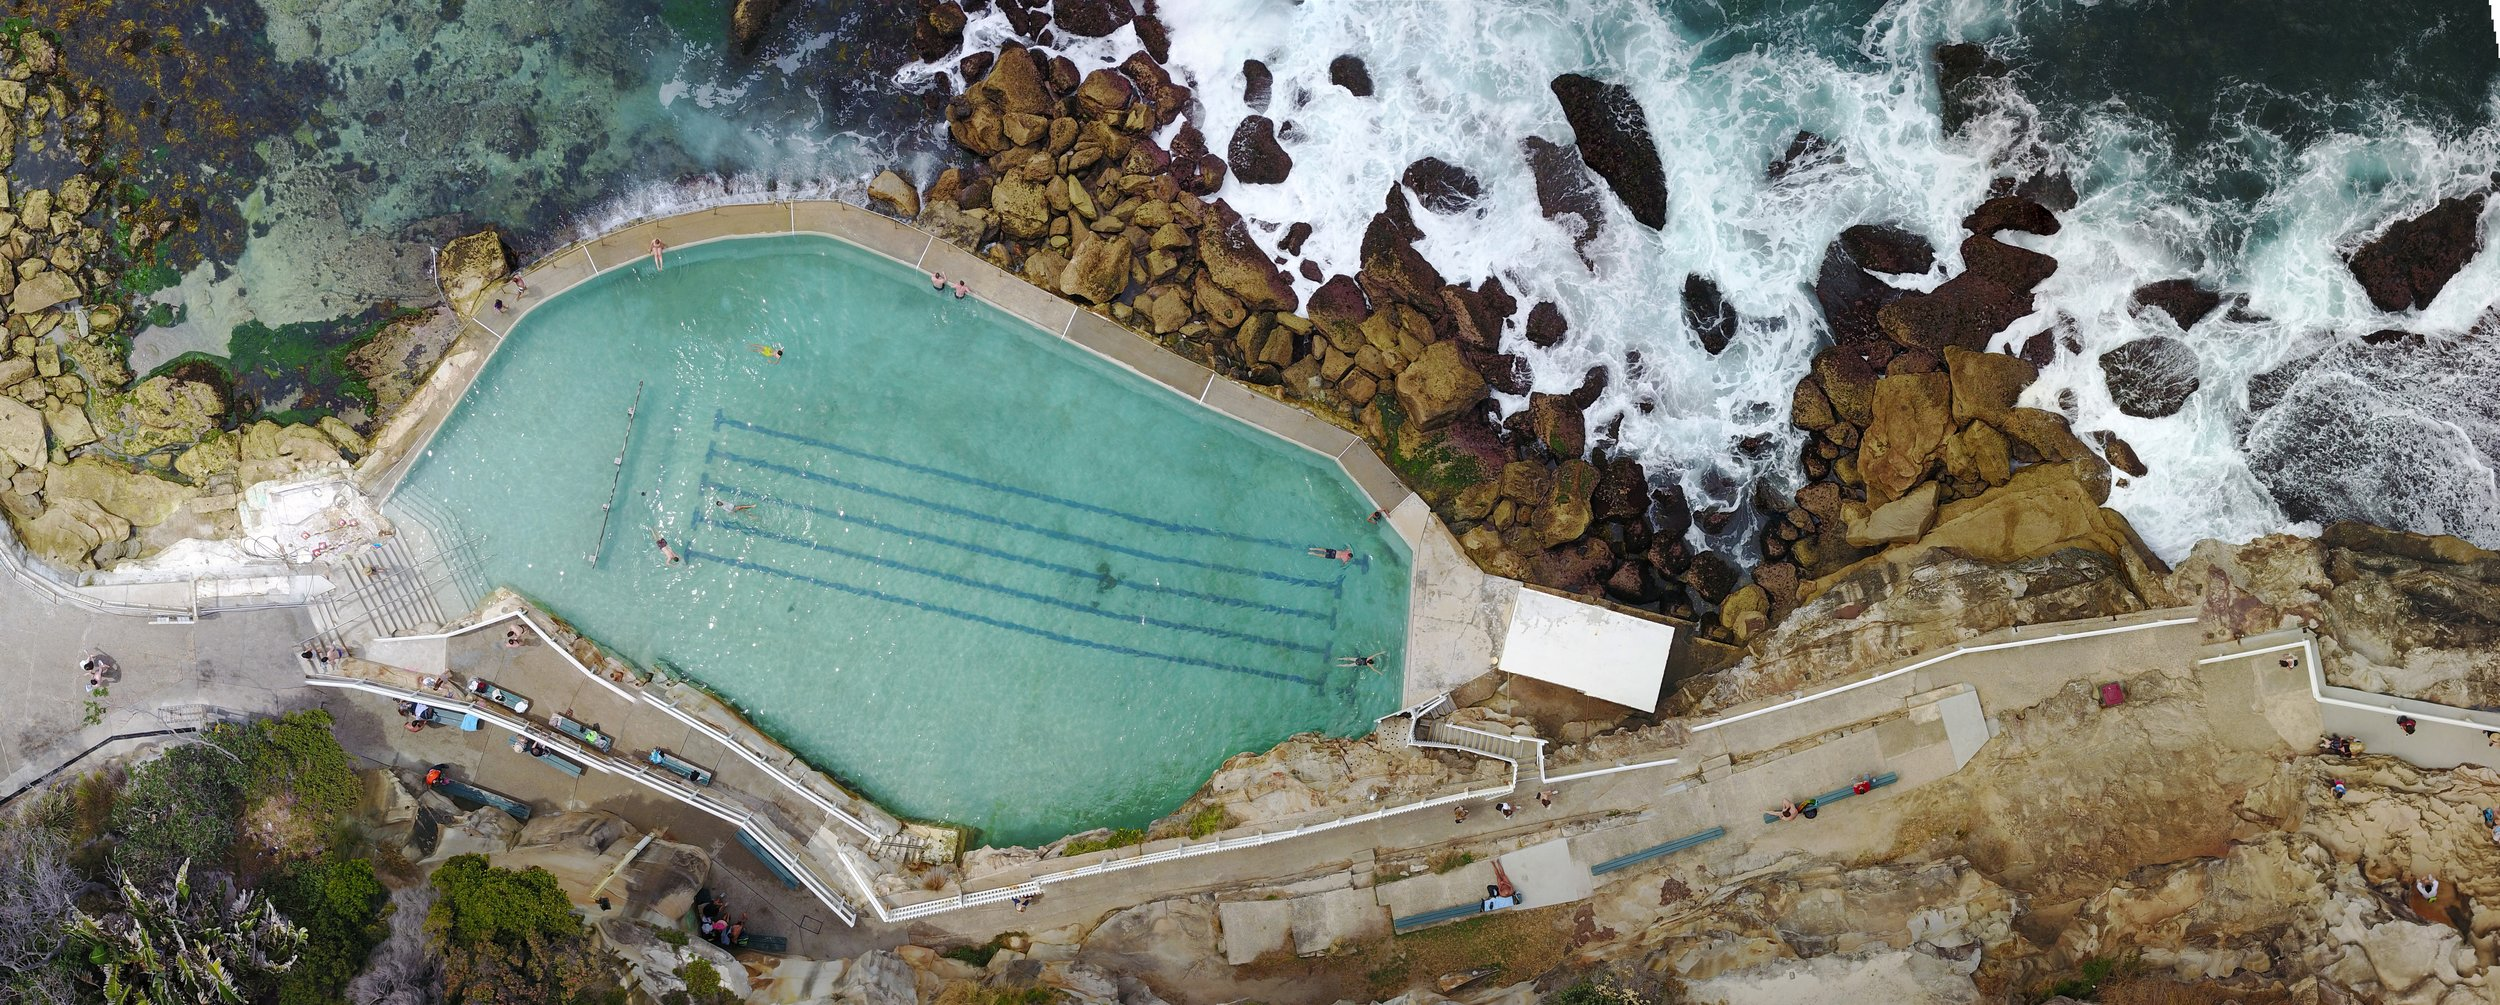 bronte - bronte baths, nsw